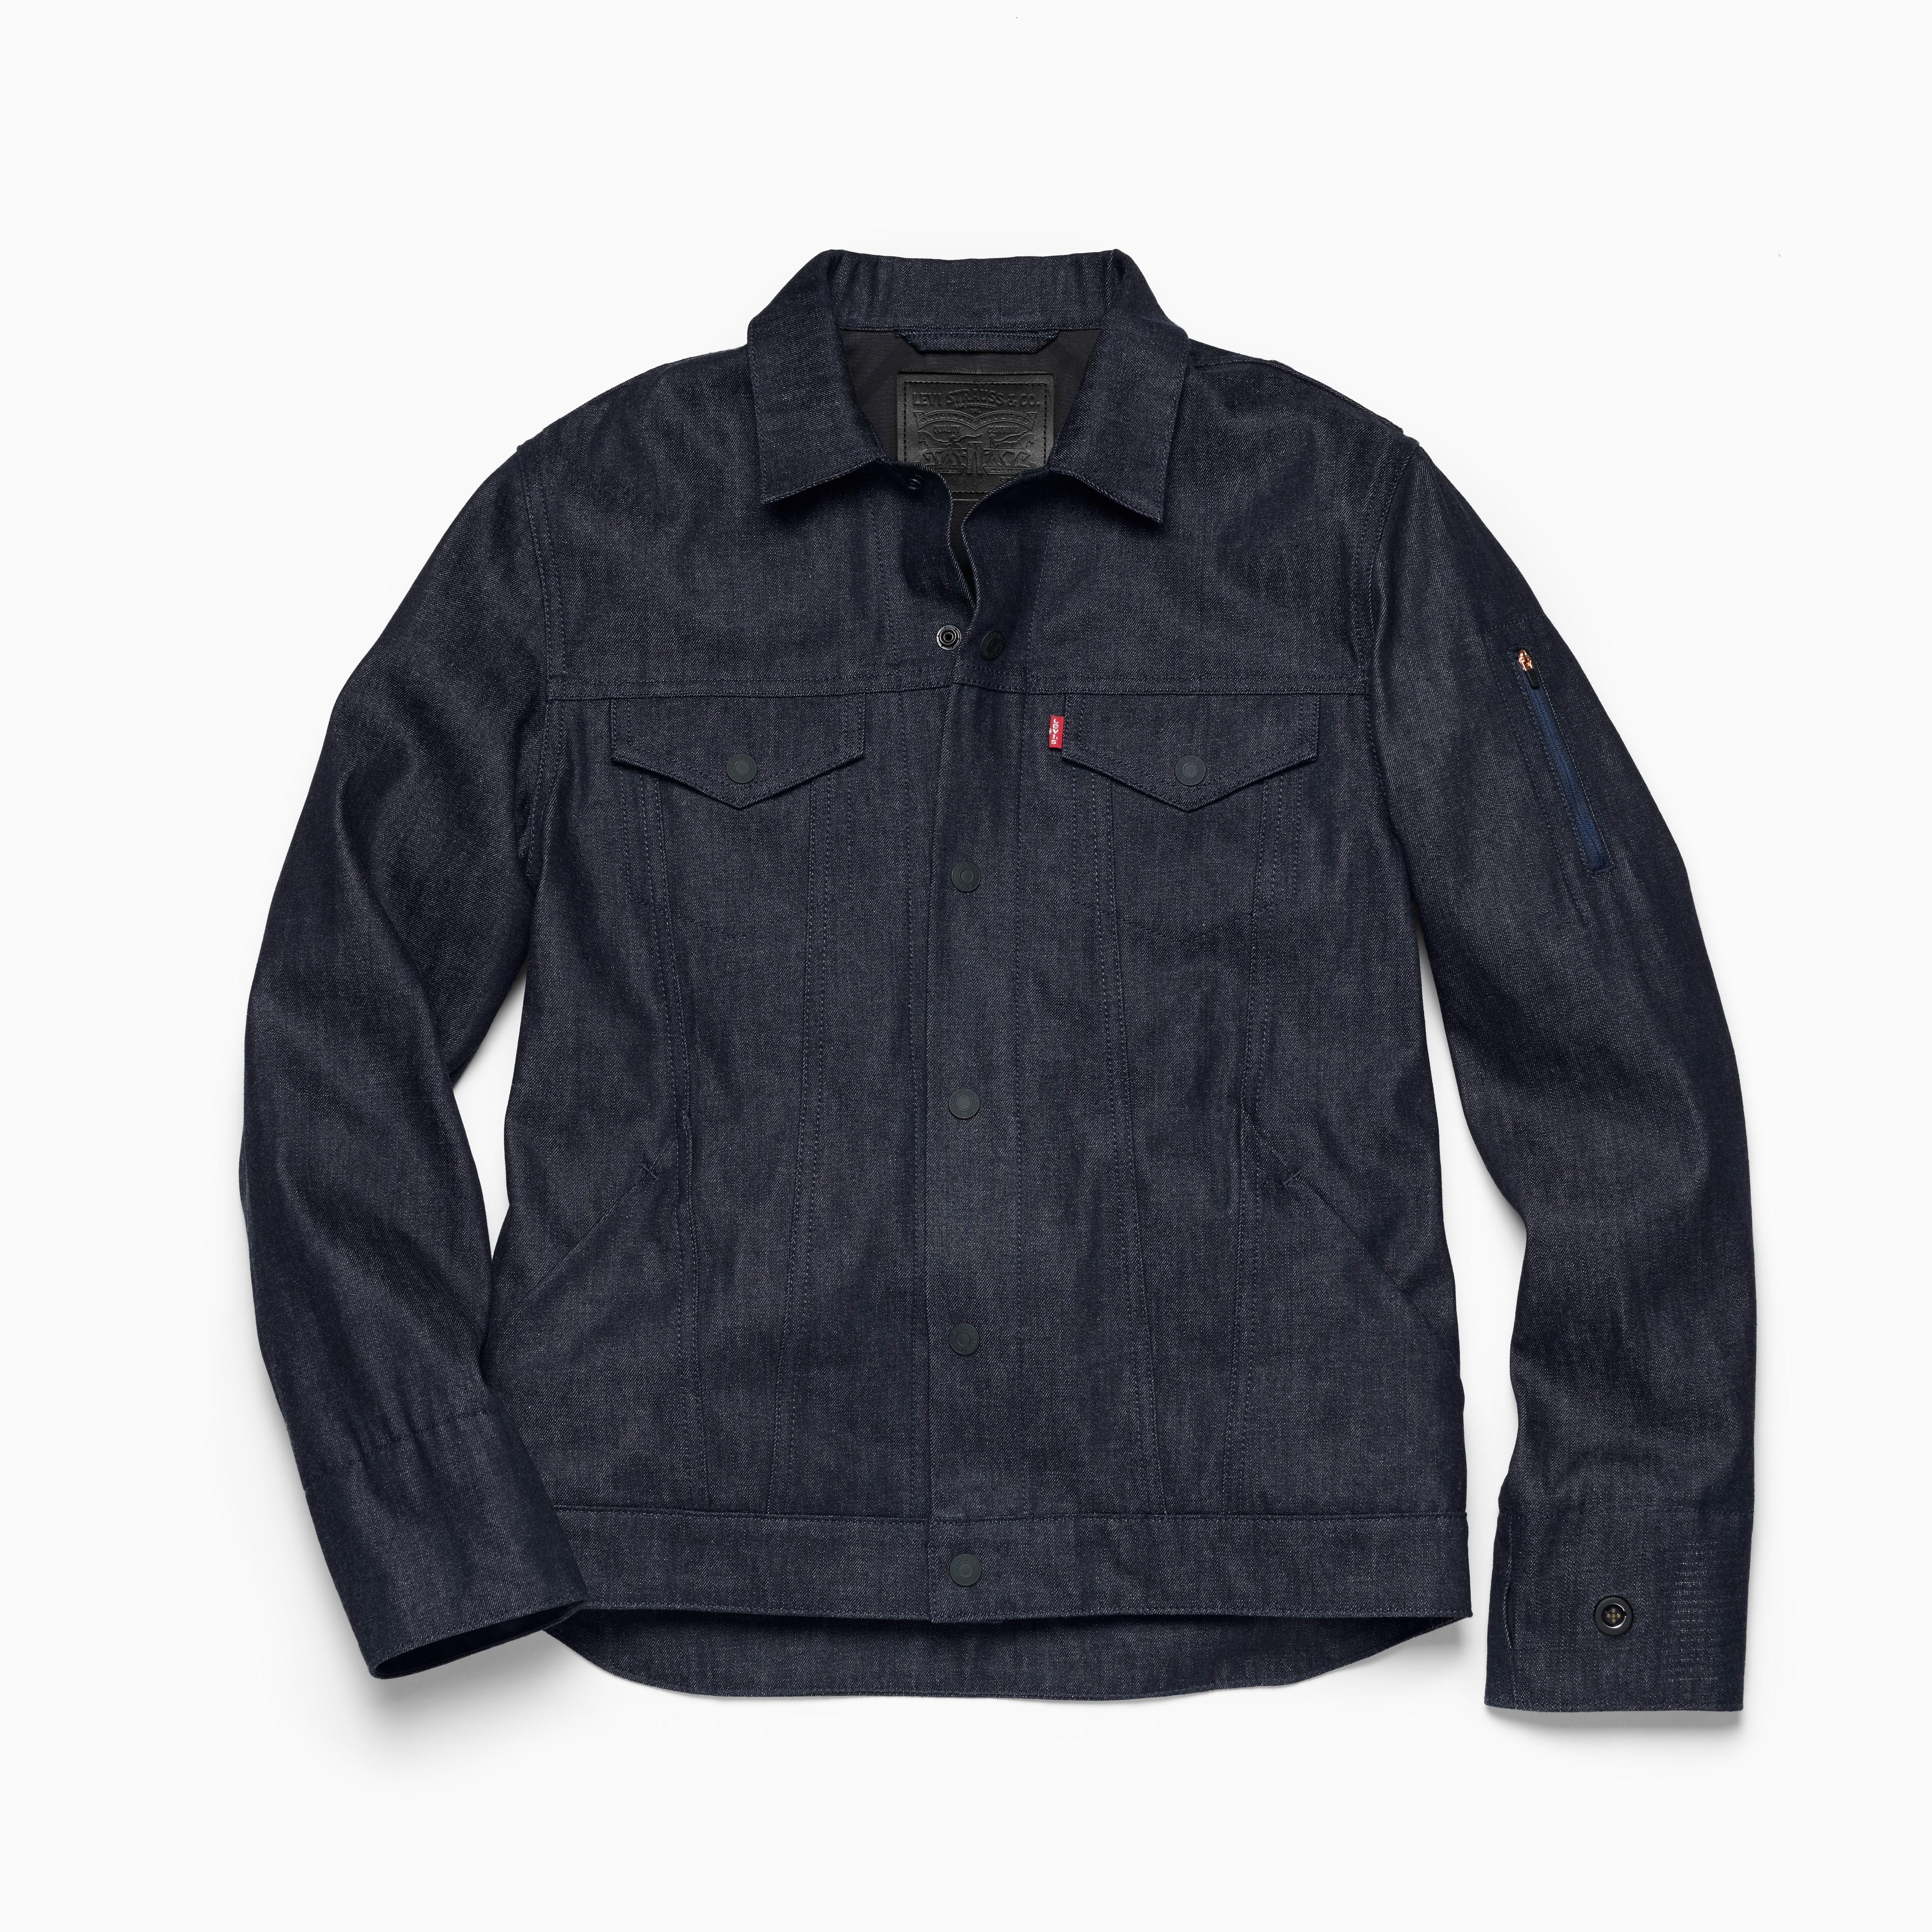 Levi's Commuter Trucker jacket project jacquard